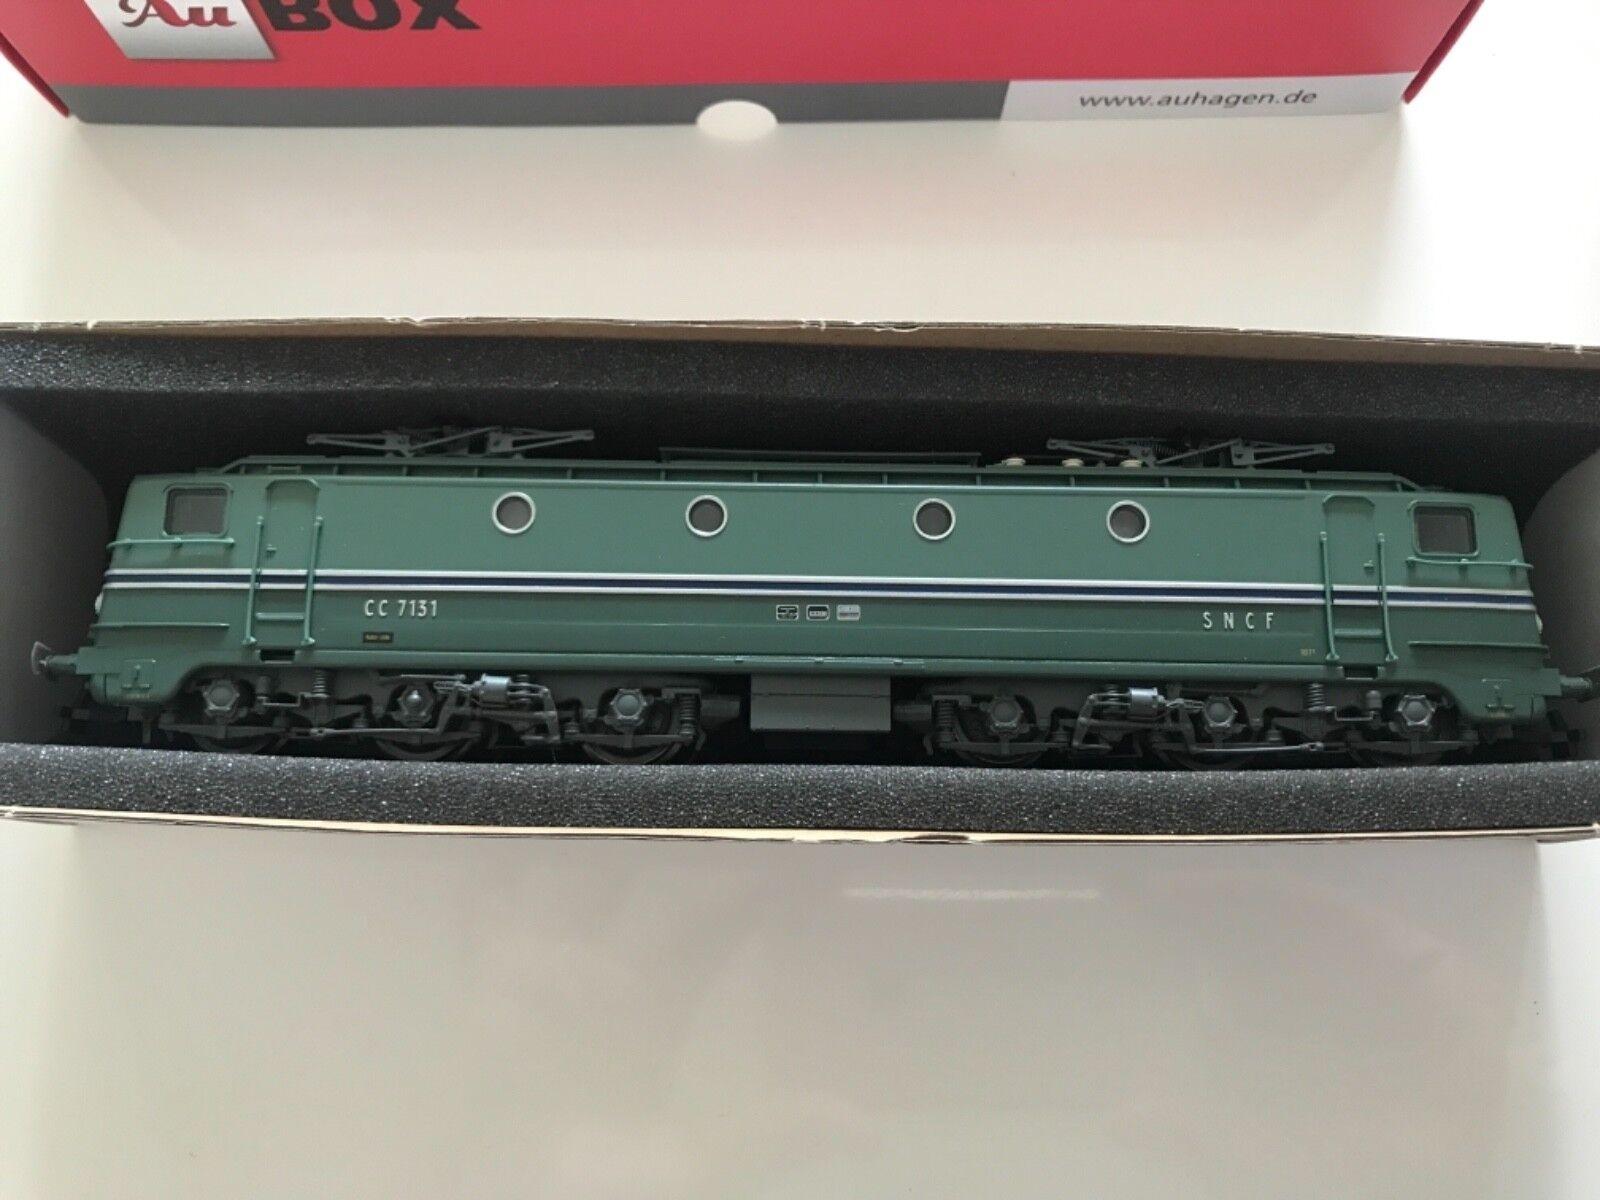 Locomotive o rivarossi 1600 cc 7100